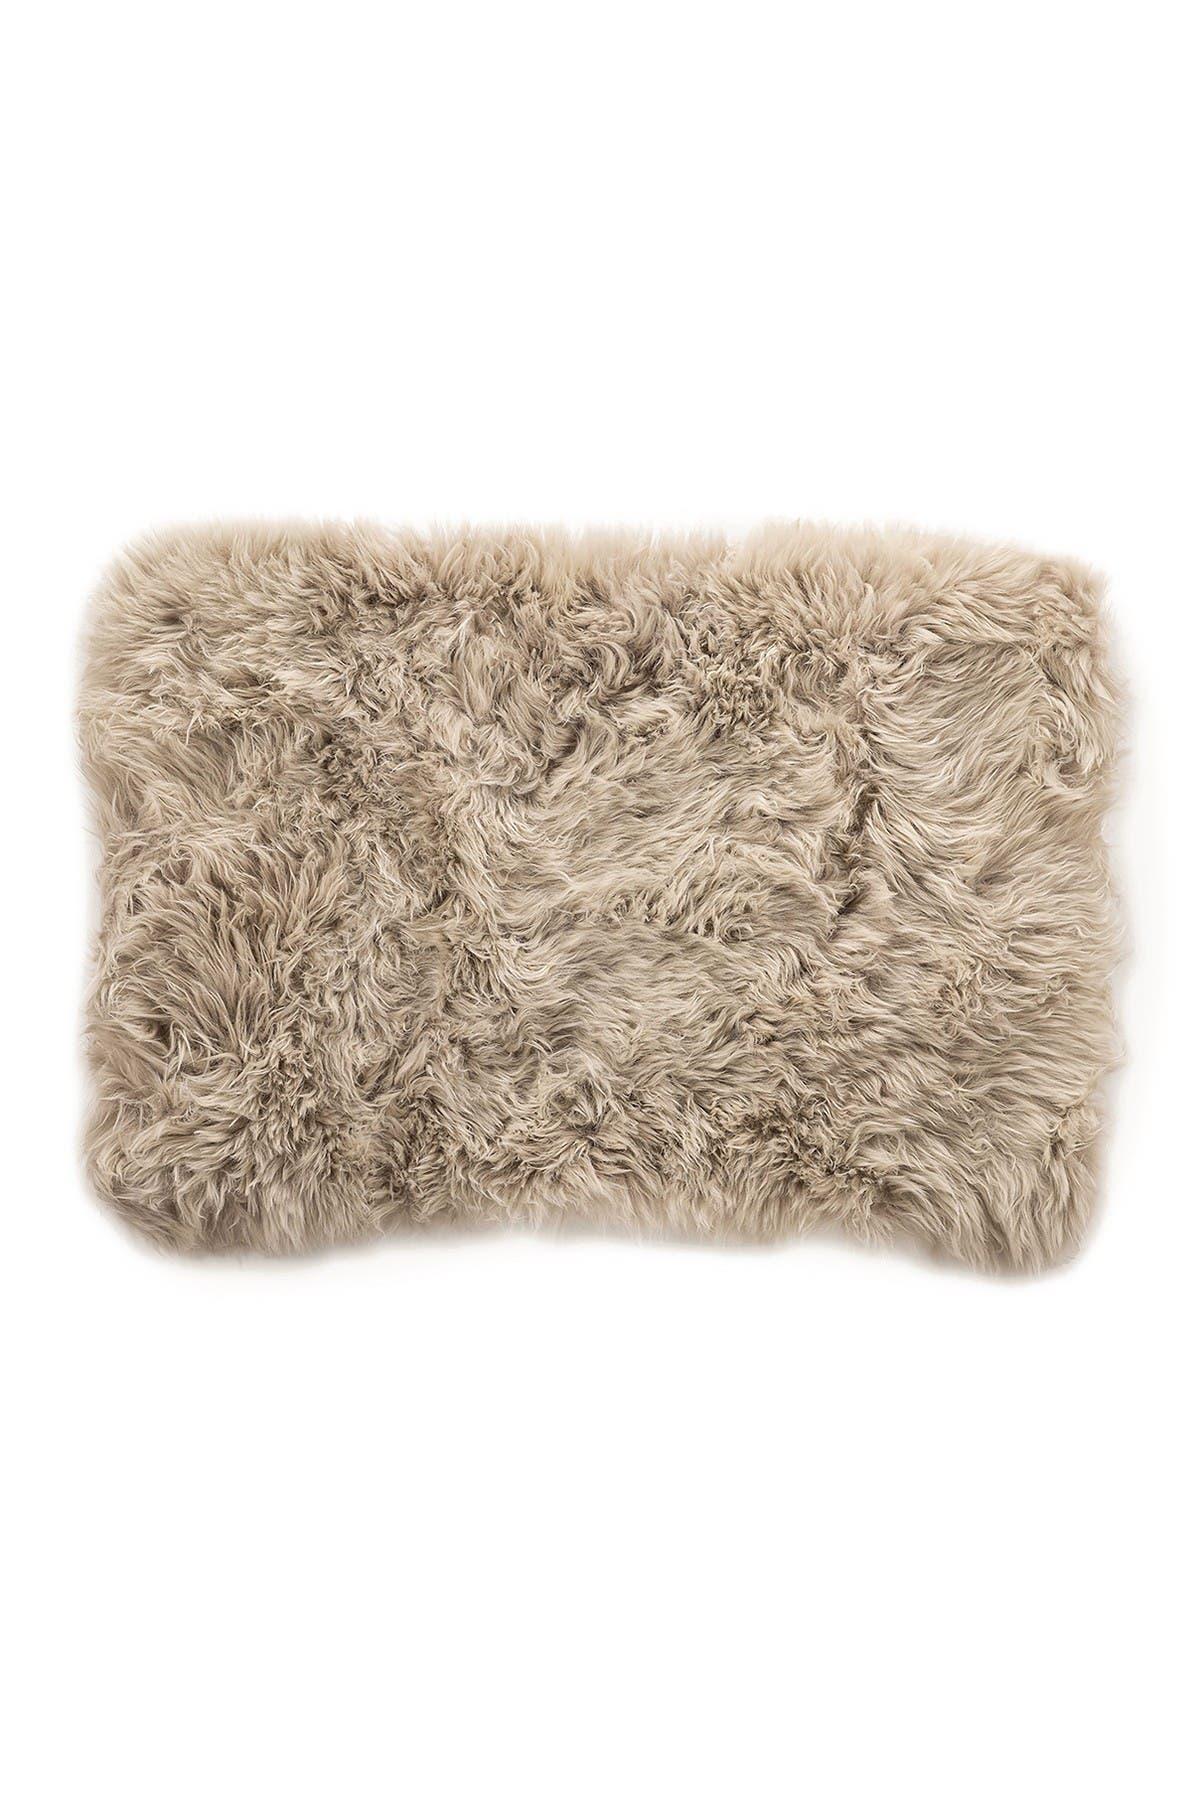 Image of Natural New Zealand Rectangular Sheepskin Throw - 2ft X 3ft - Taupe